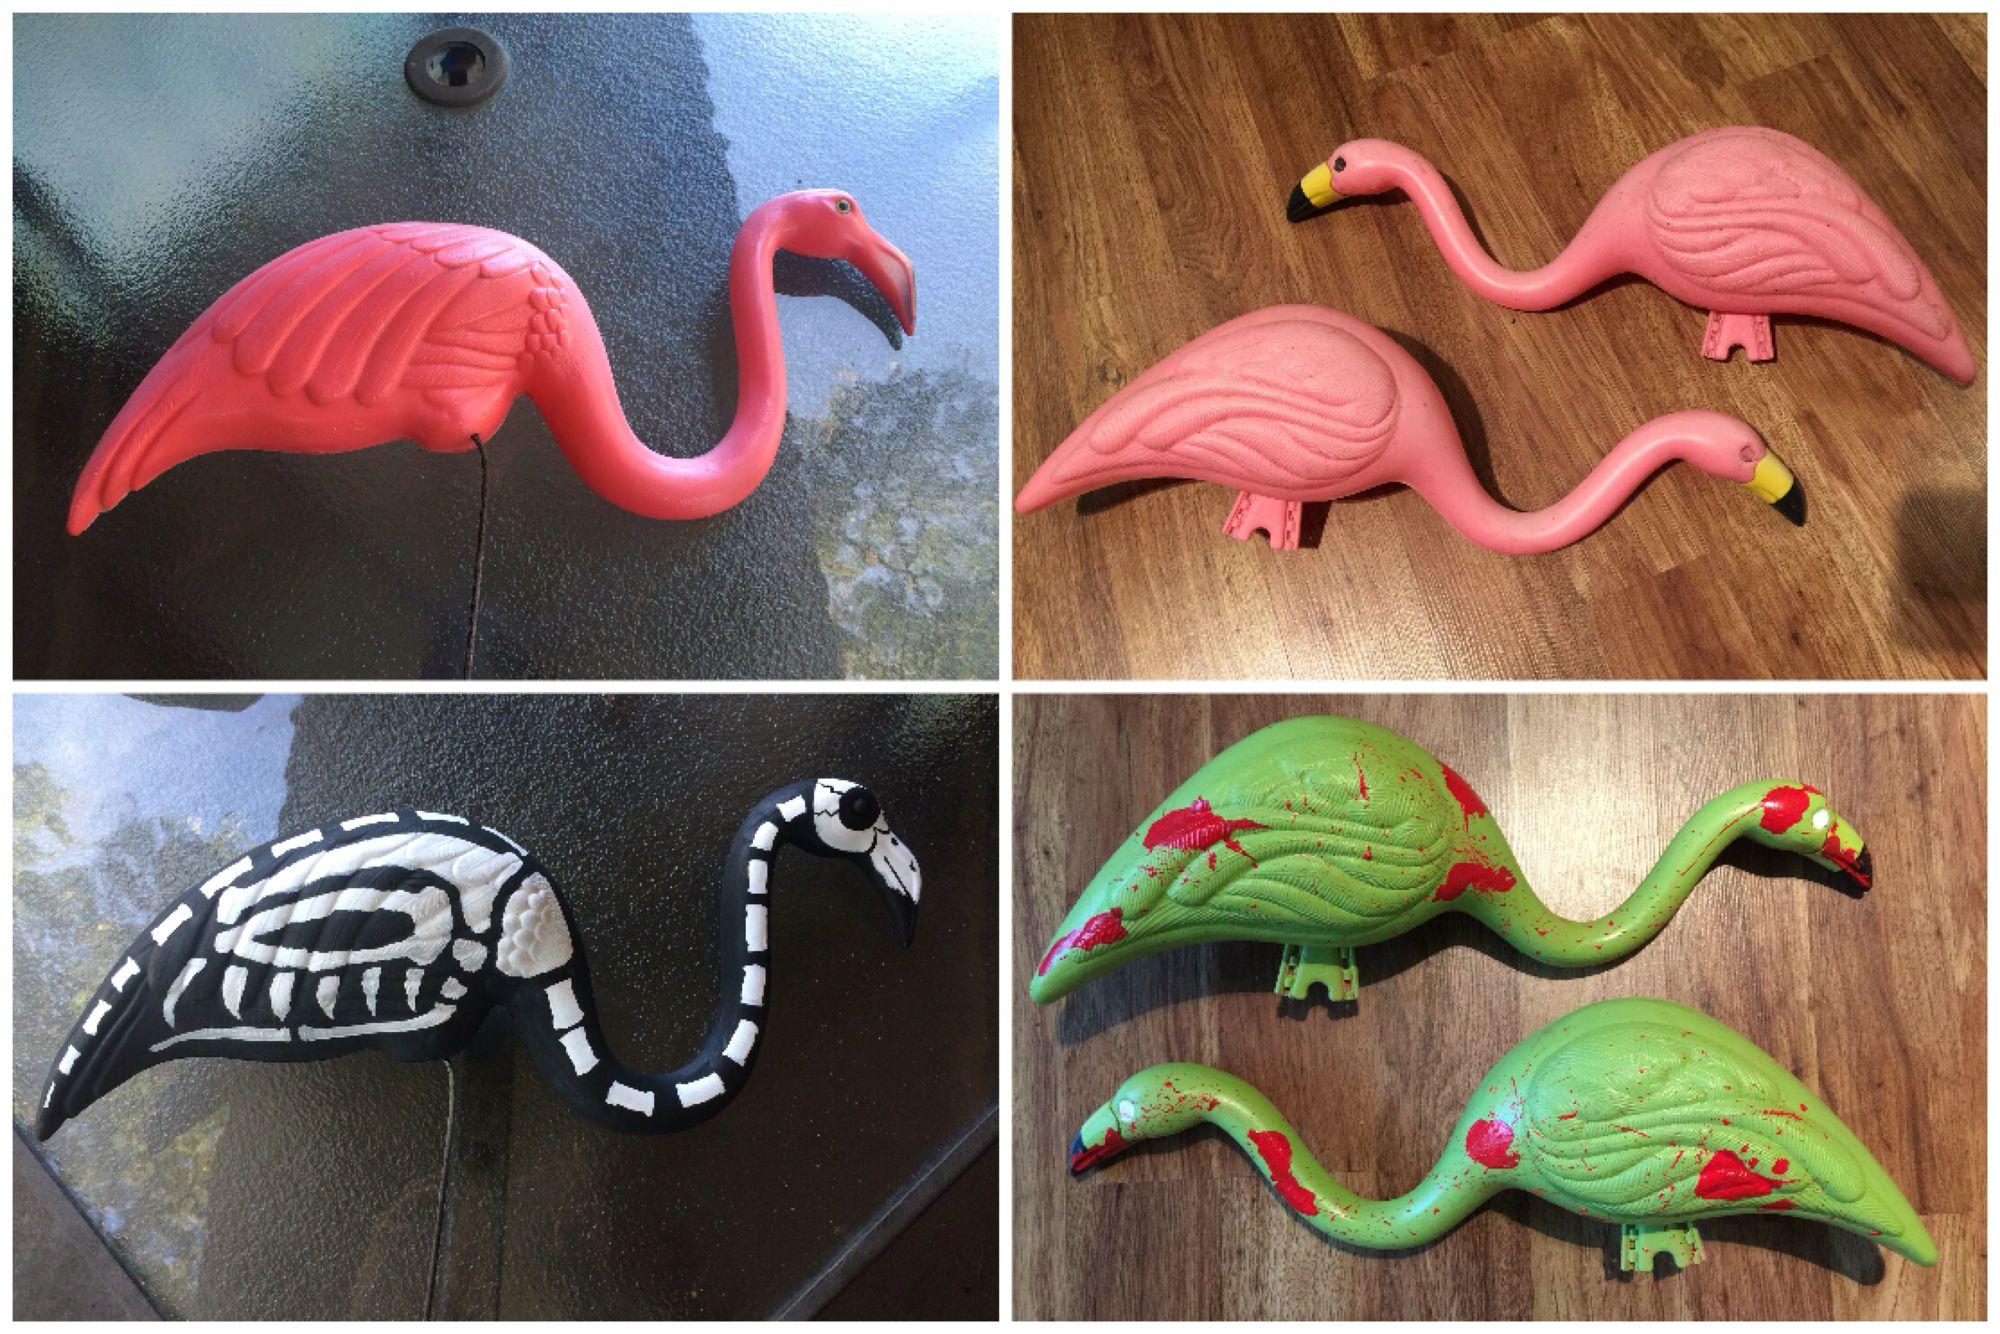 diy halloween painted flamingo. skeleton flamingo. zombie flamingo